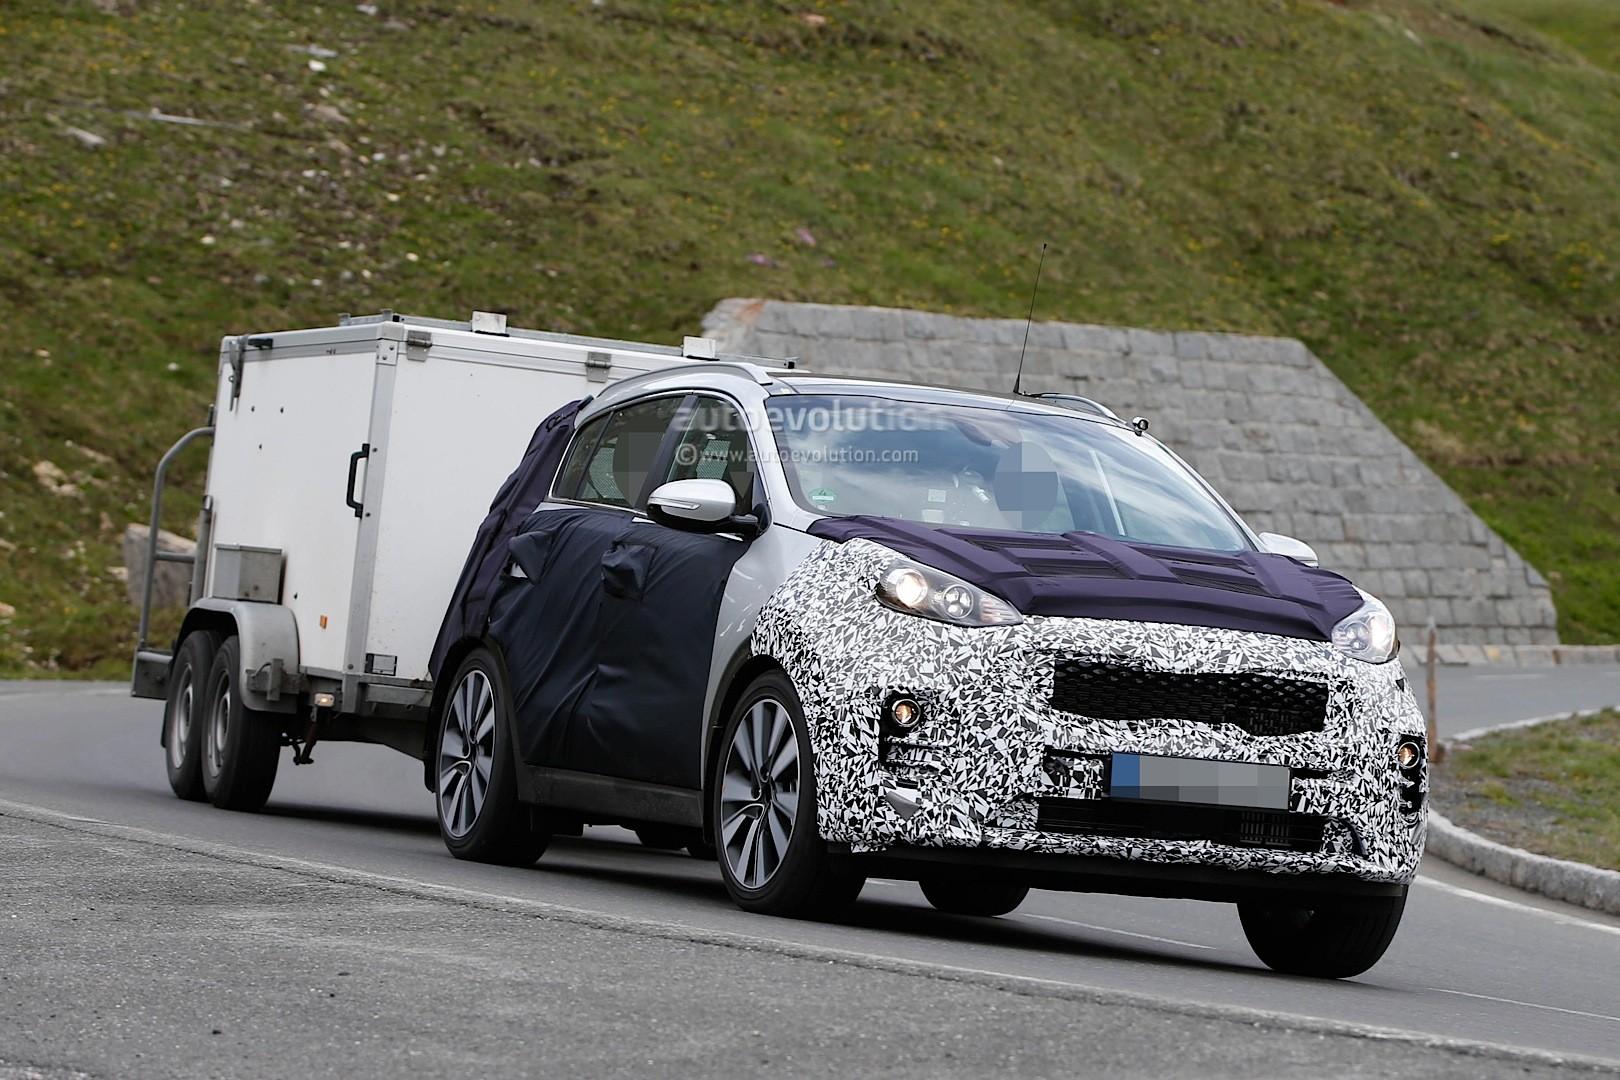 Spyshots 2016 Kia Sportage Interior And New Headlight